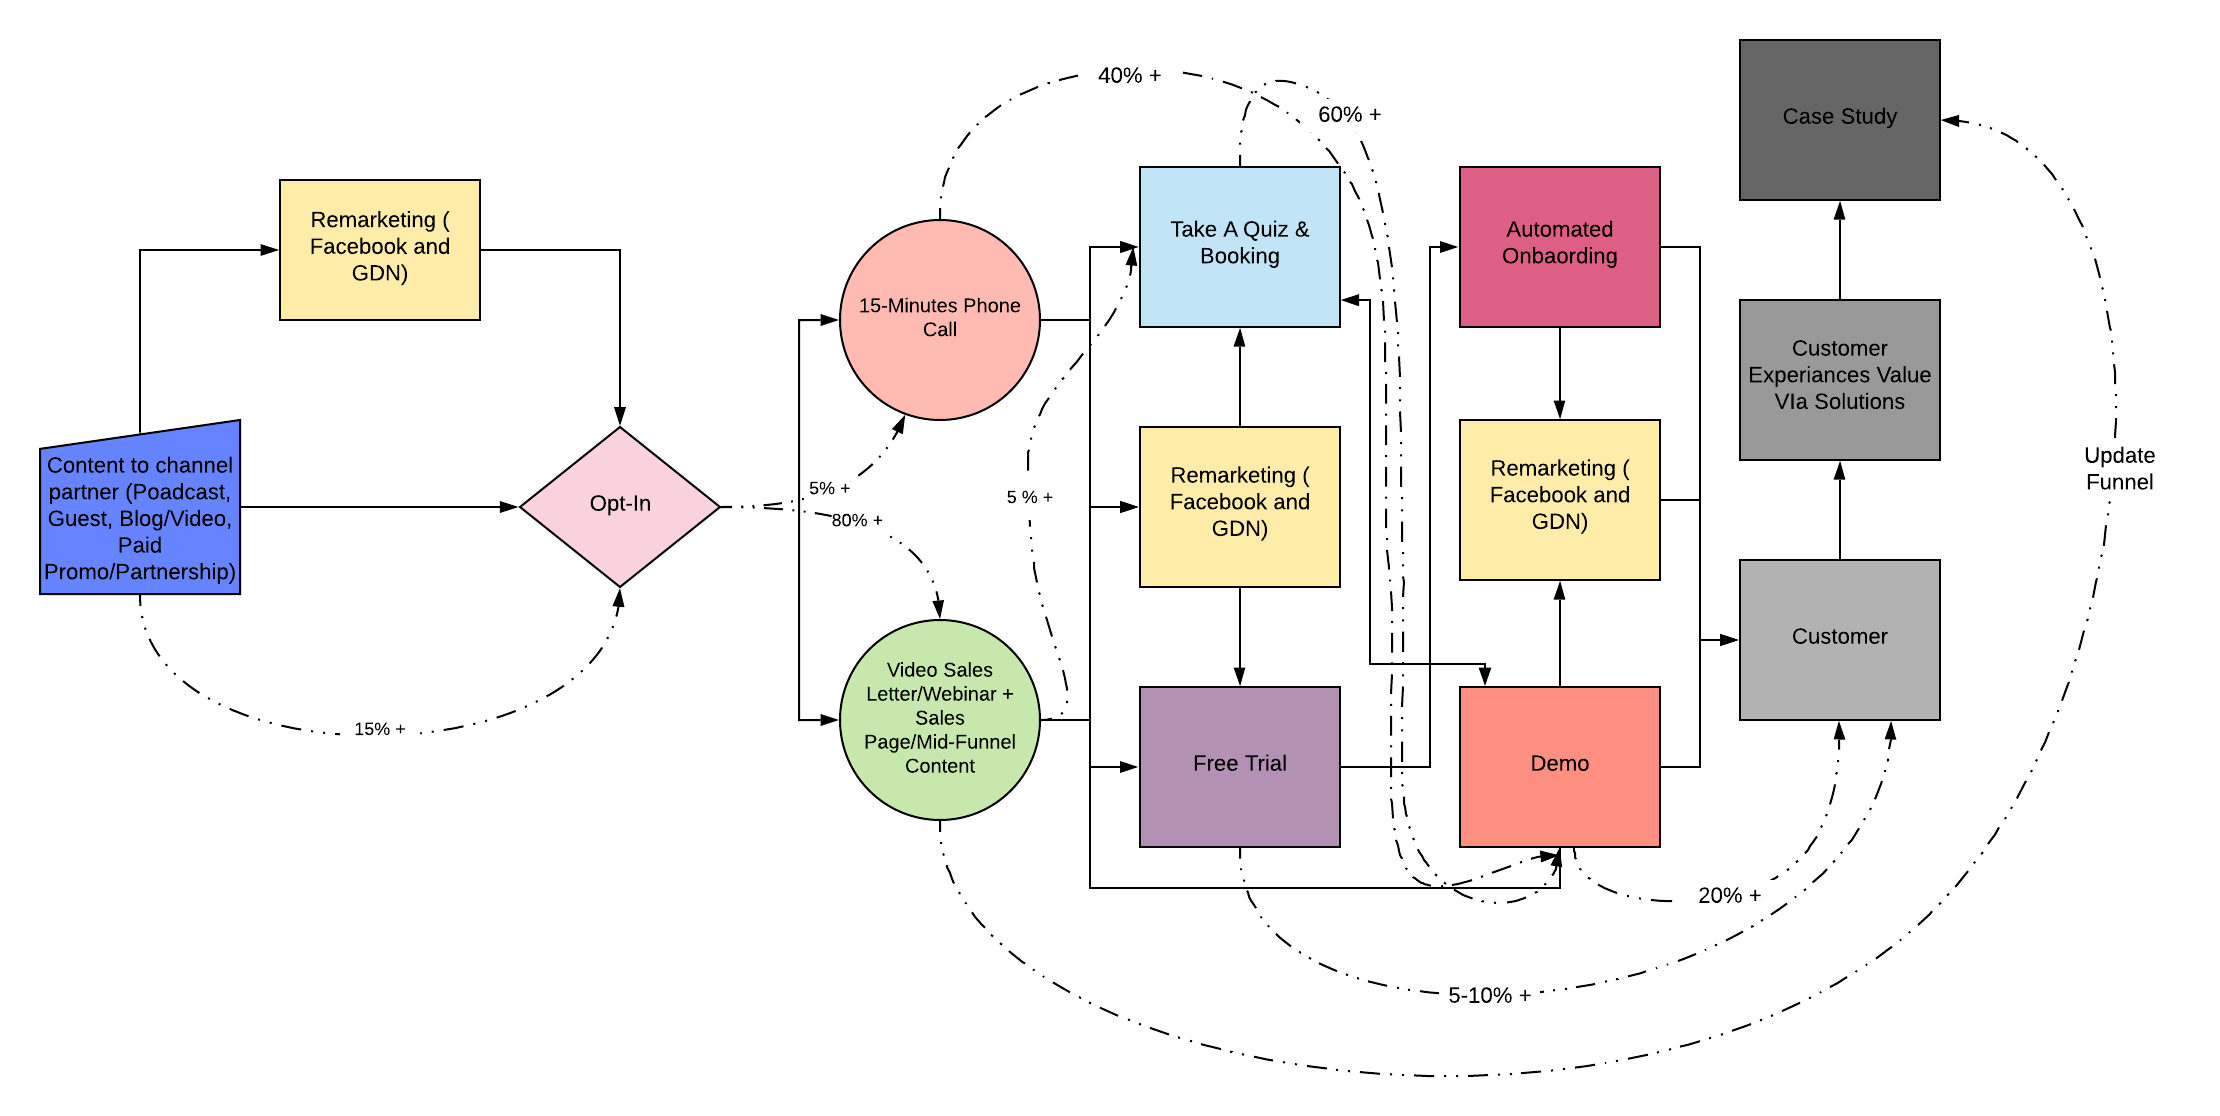 Content Marketing Organic Funnel + Inside Sales